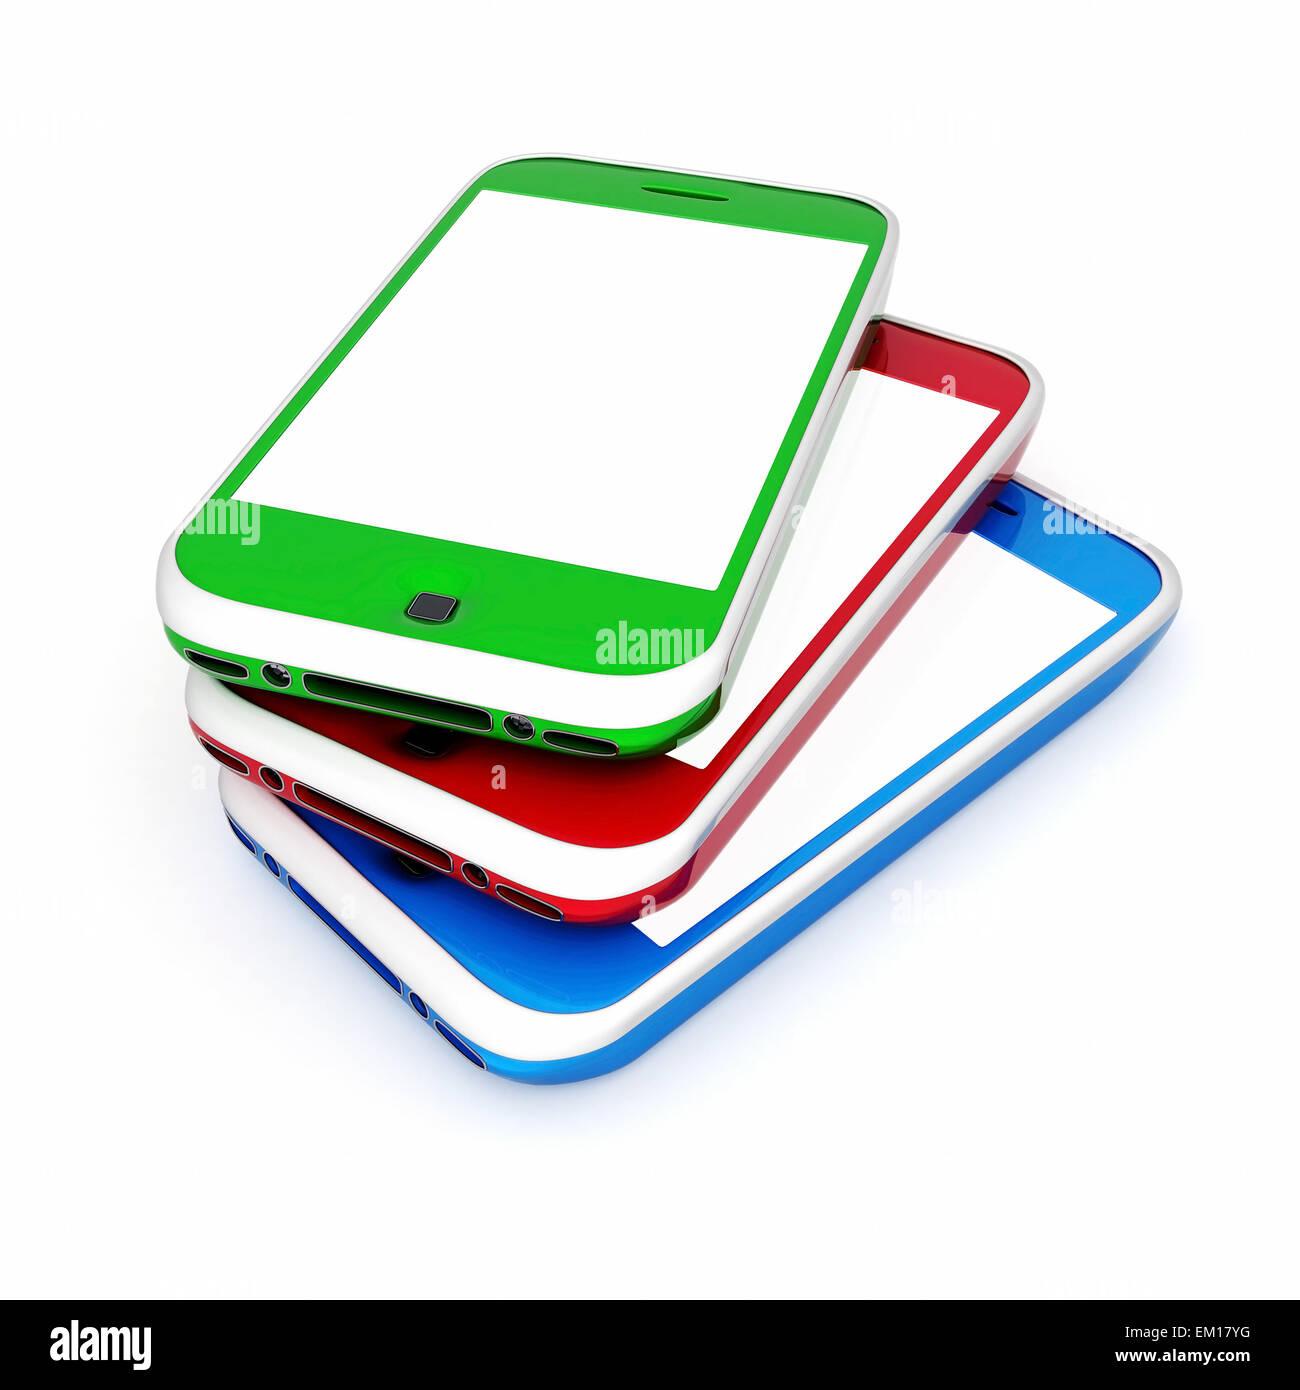 Image smartphone - Stock Image